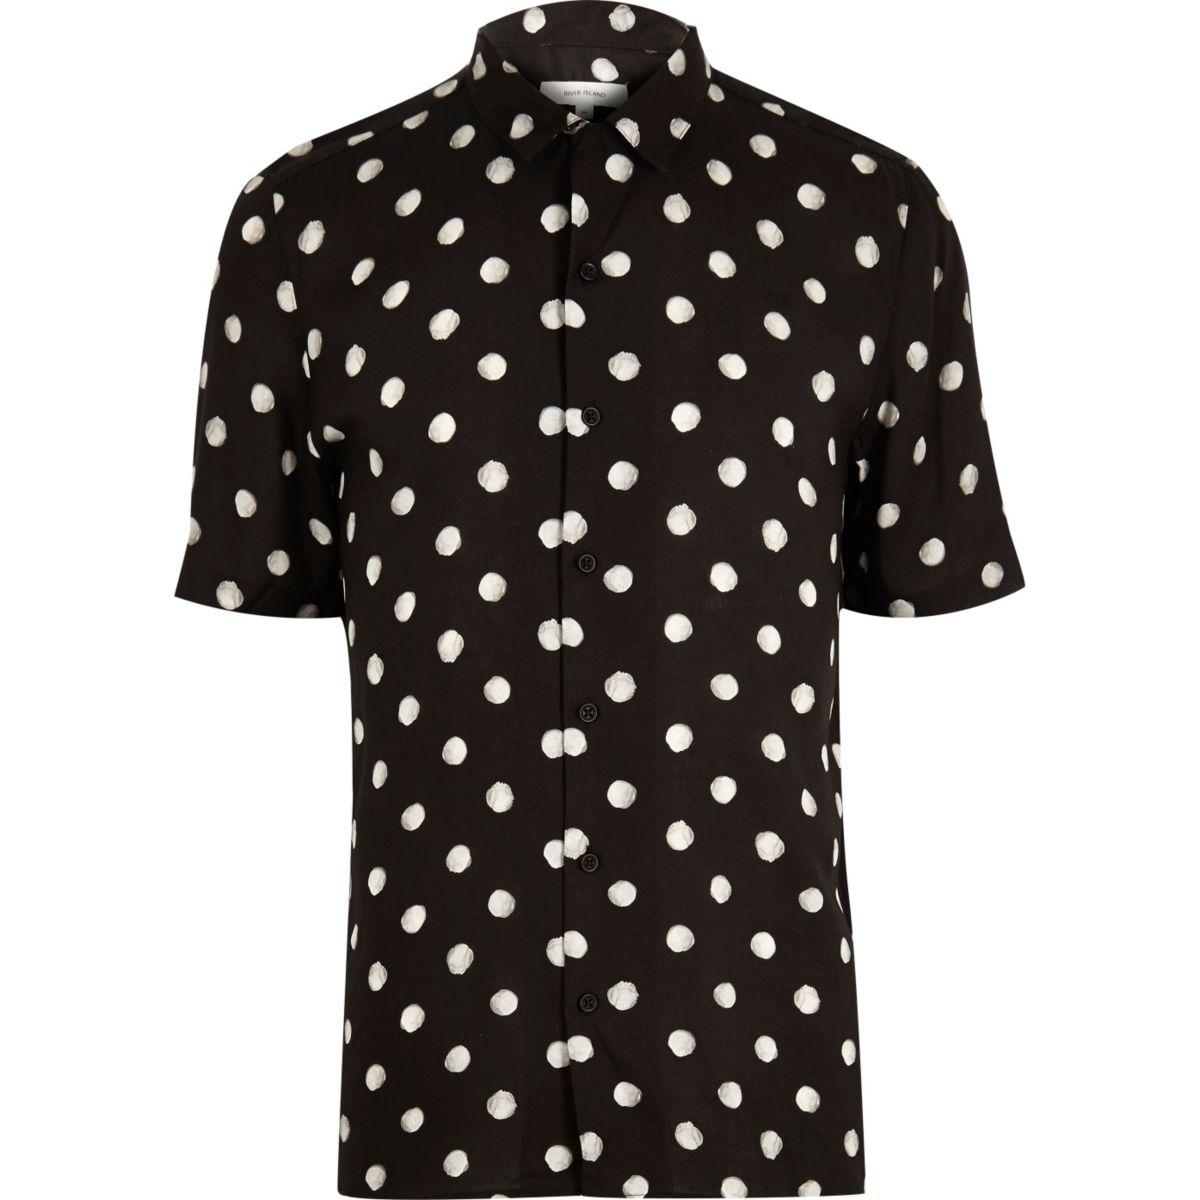 Black dotted short sleeve shirt